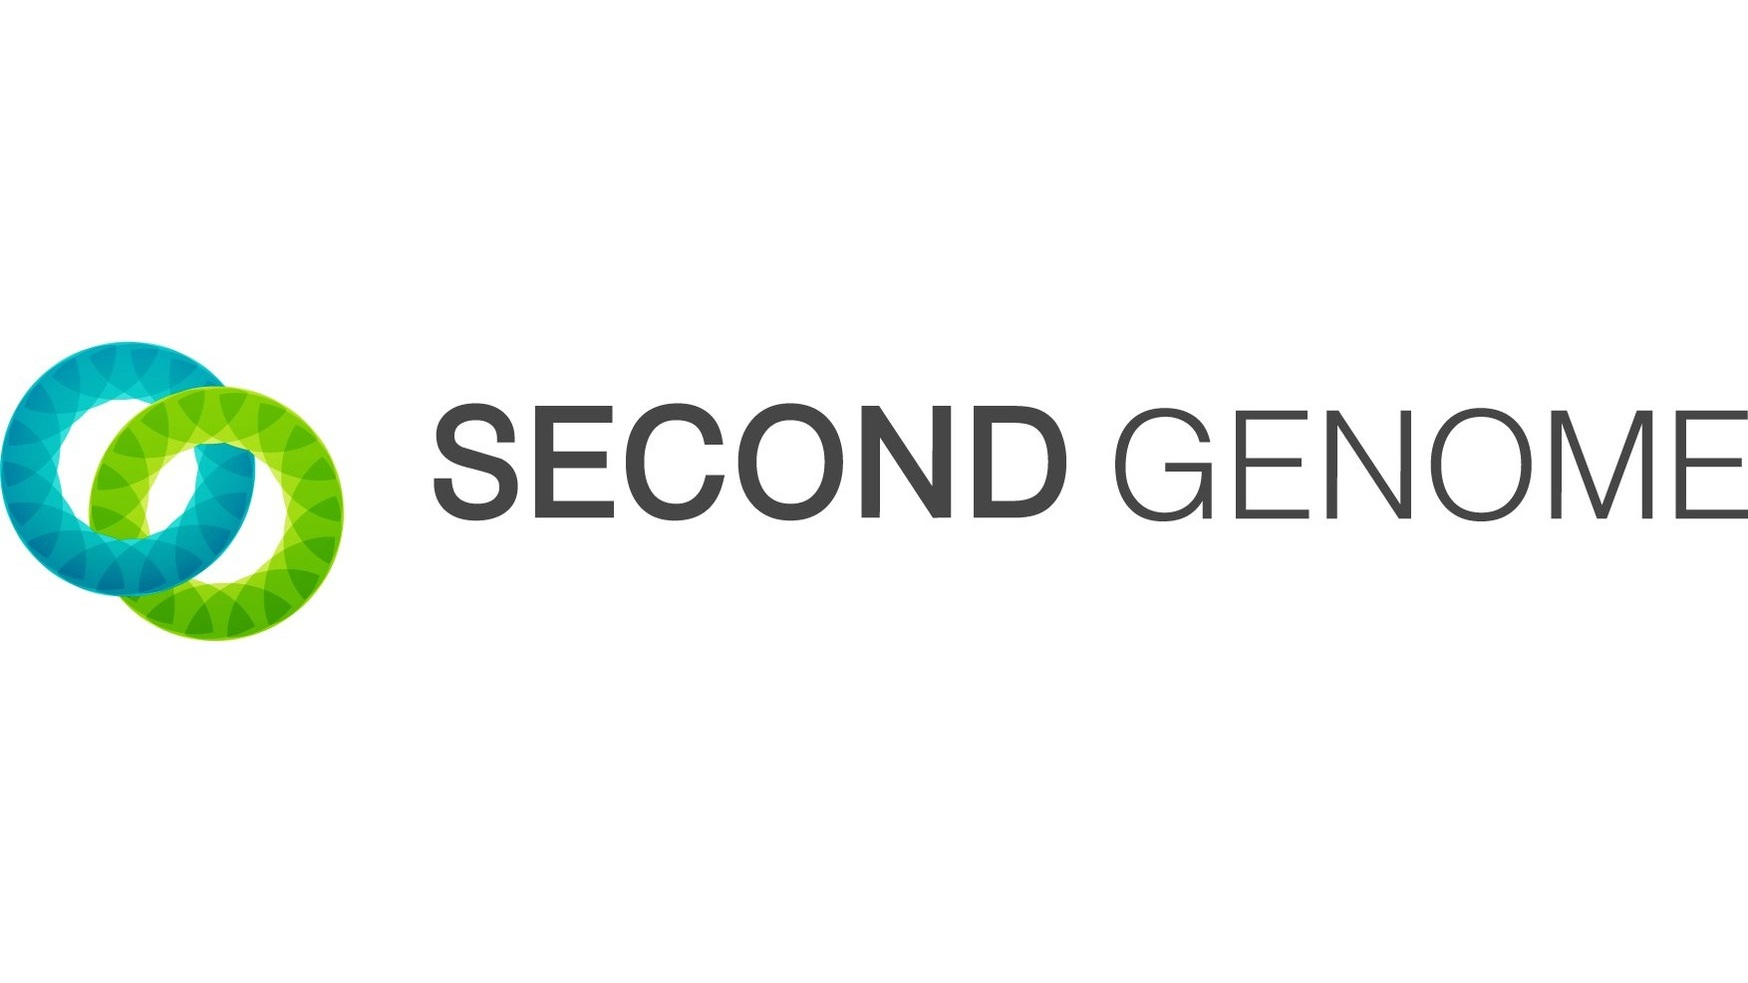 second genome logo.jpeg